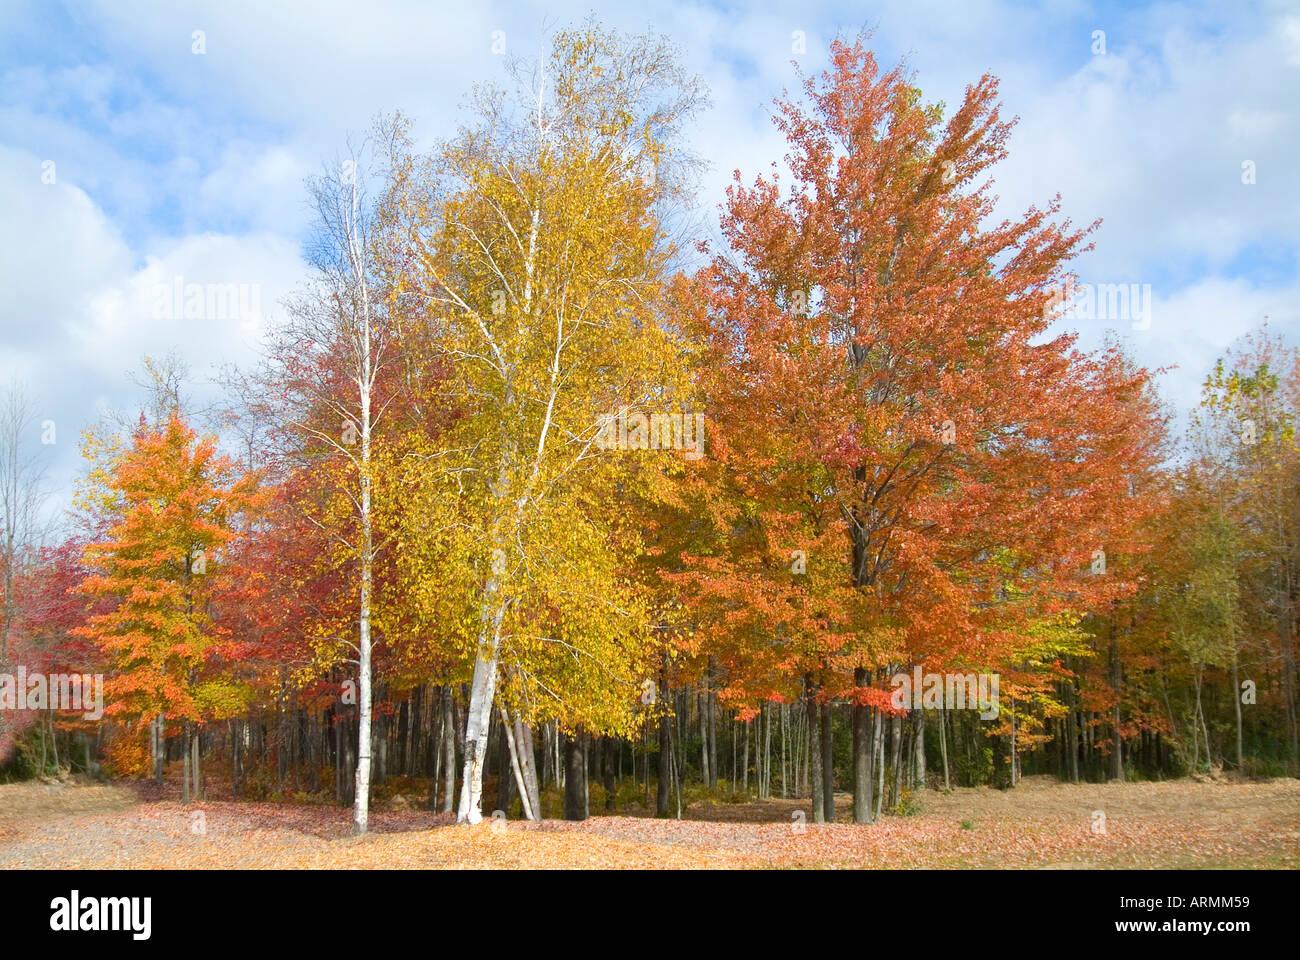 Autumn fall colors in southeastern Michigan near port huron Michigan - Stock Image